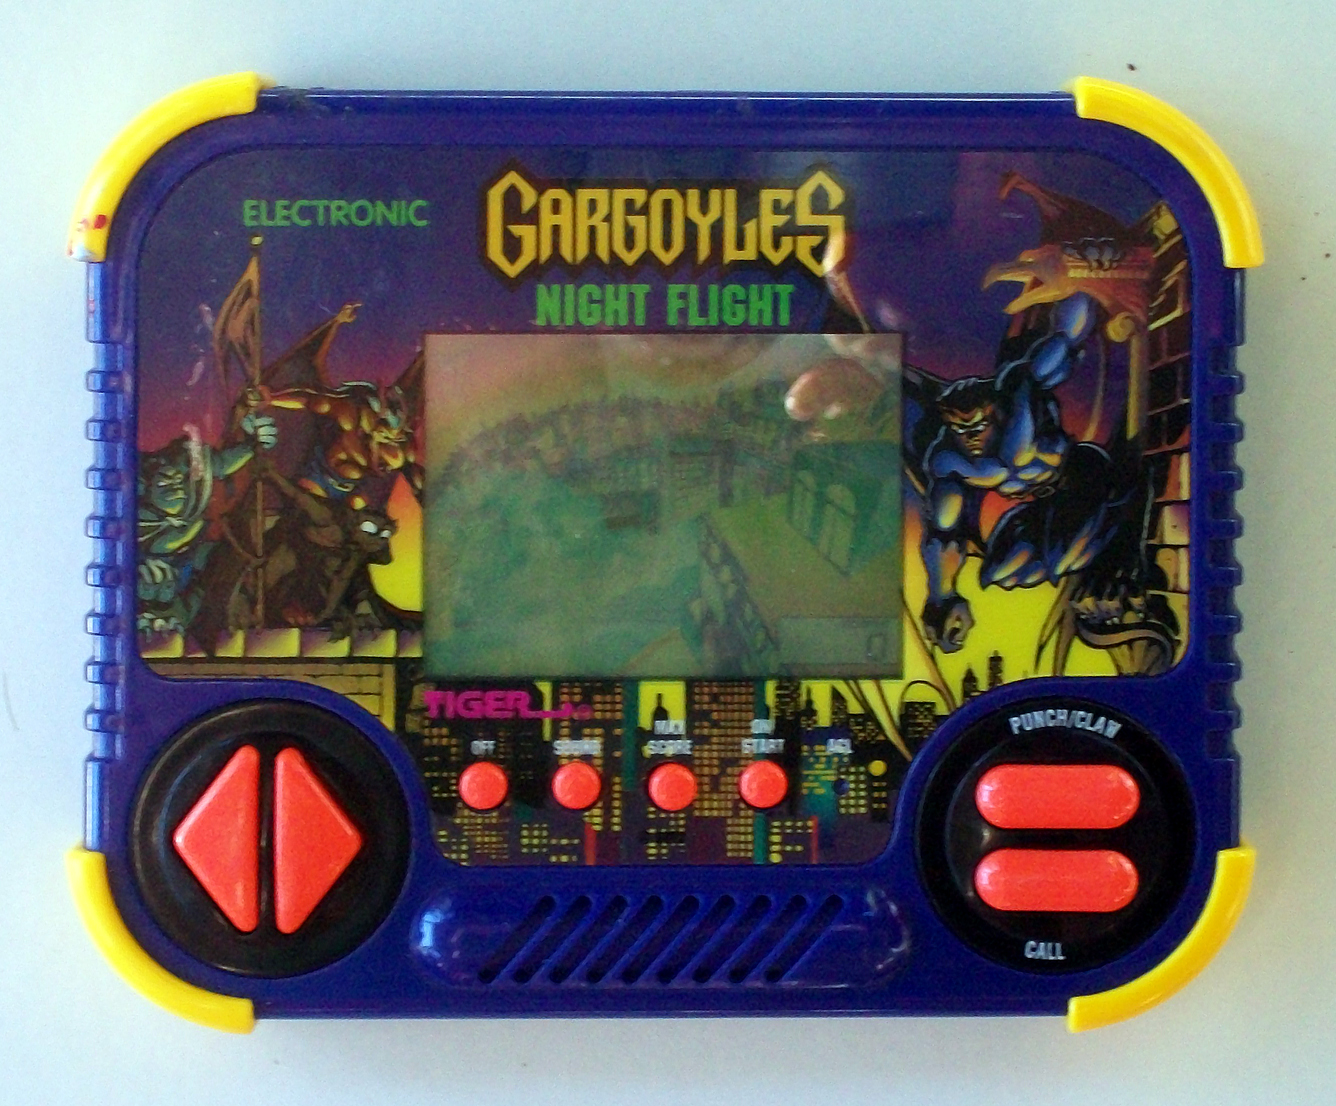 Gargoyles: Night Flight